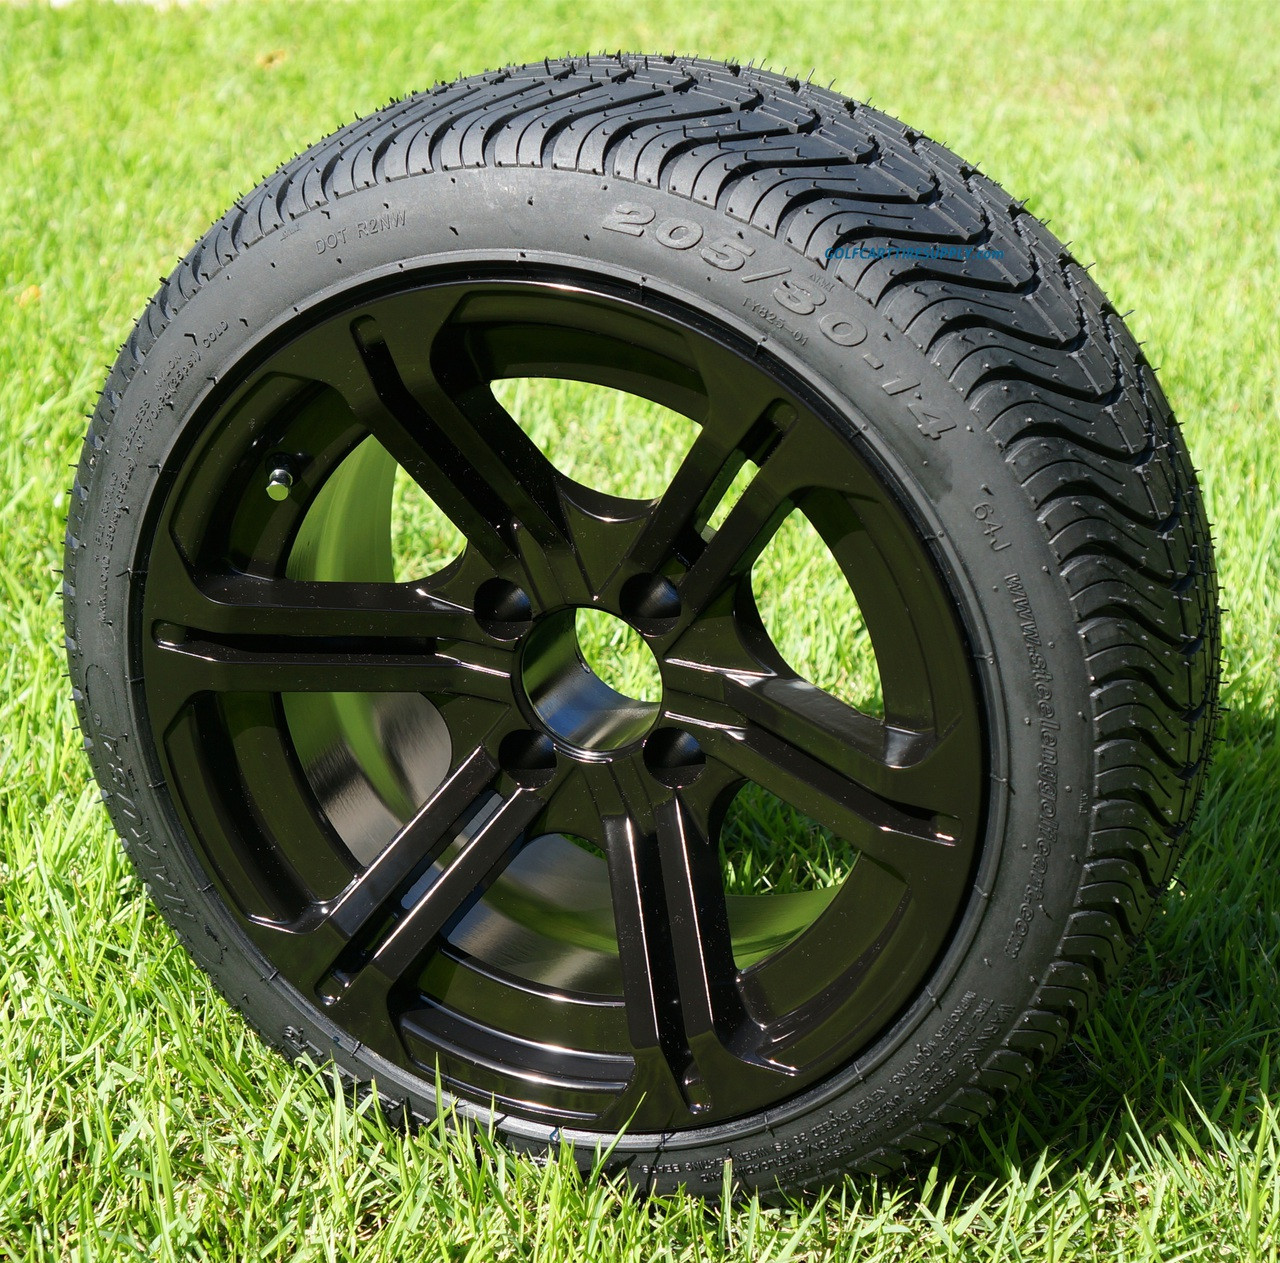 14 reaper golf cart wheels and 205 30 14 dot golf cart tires combo golf cart tire supply. Black Bedroom Furniture Sets. Home Design Ideas